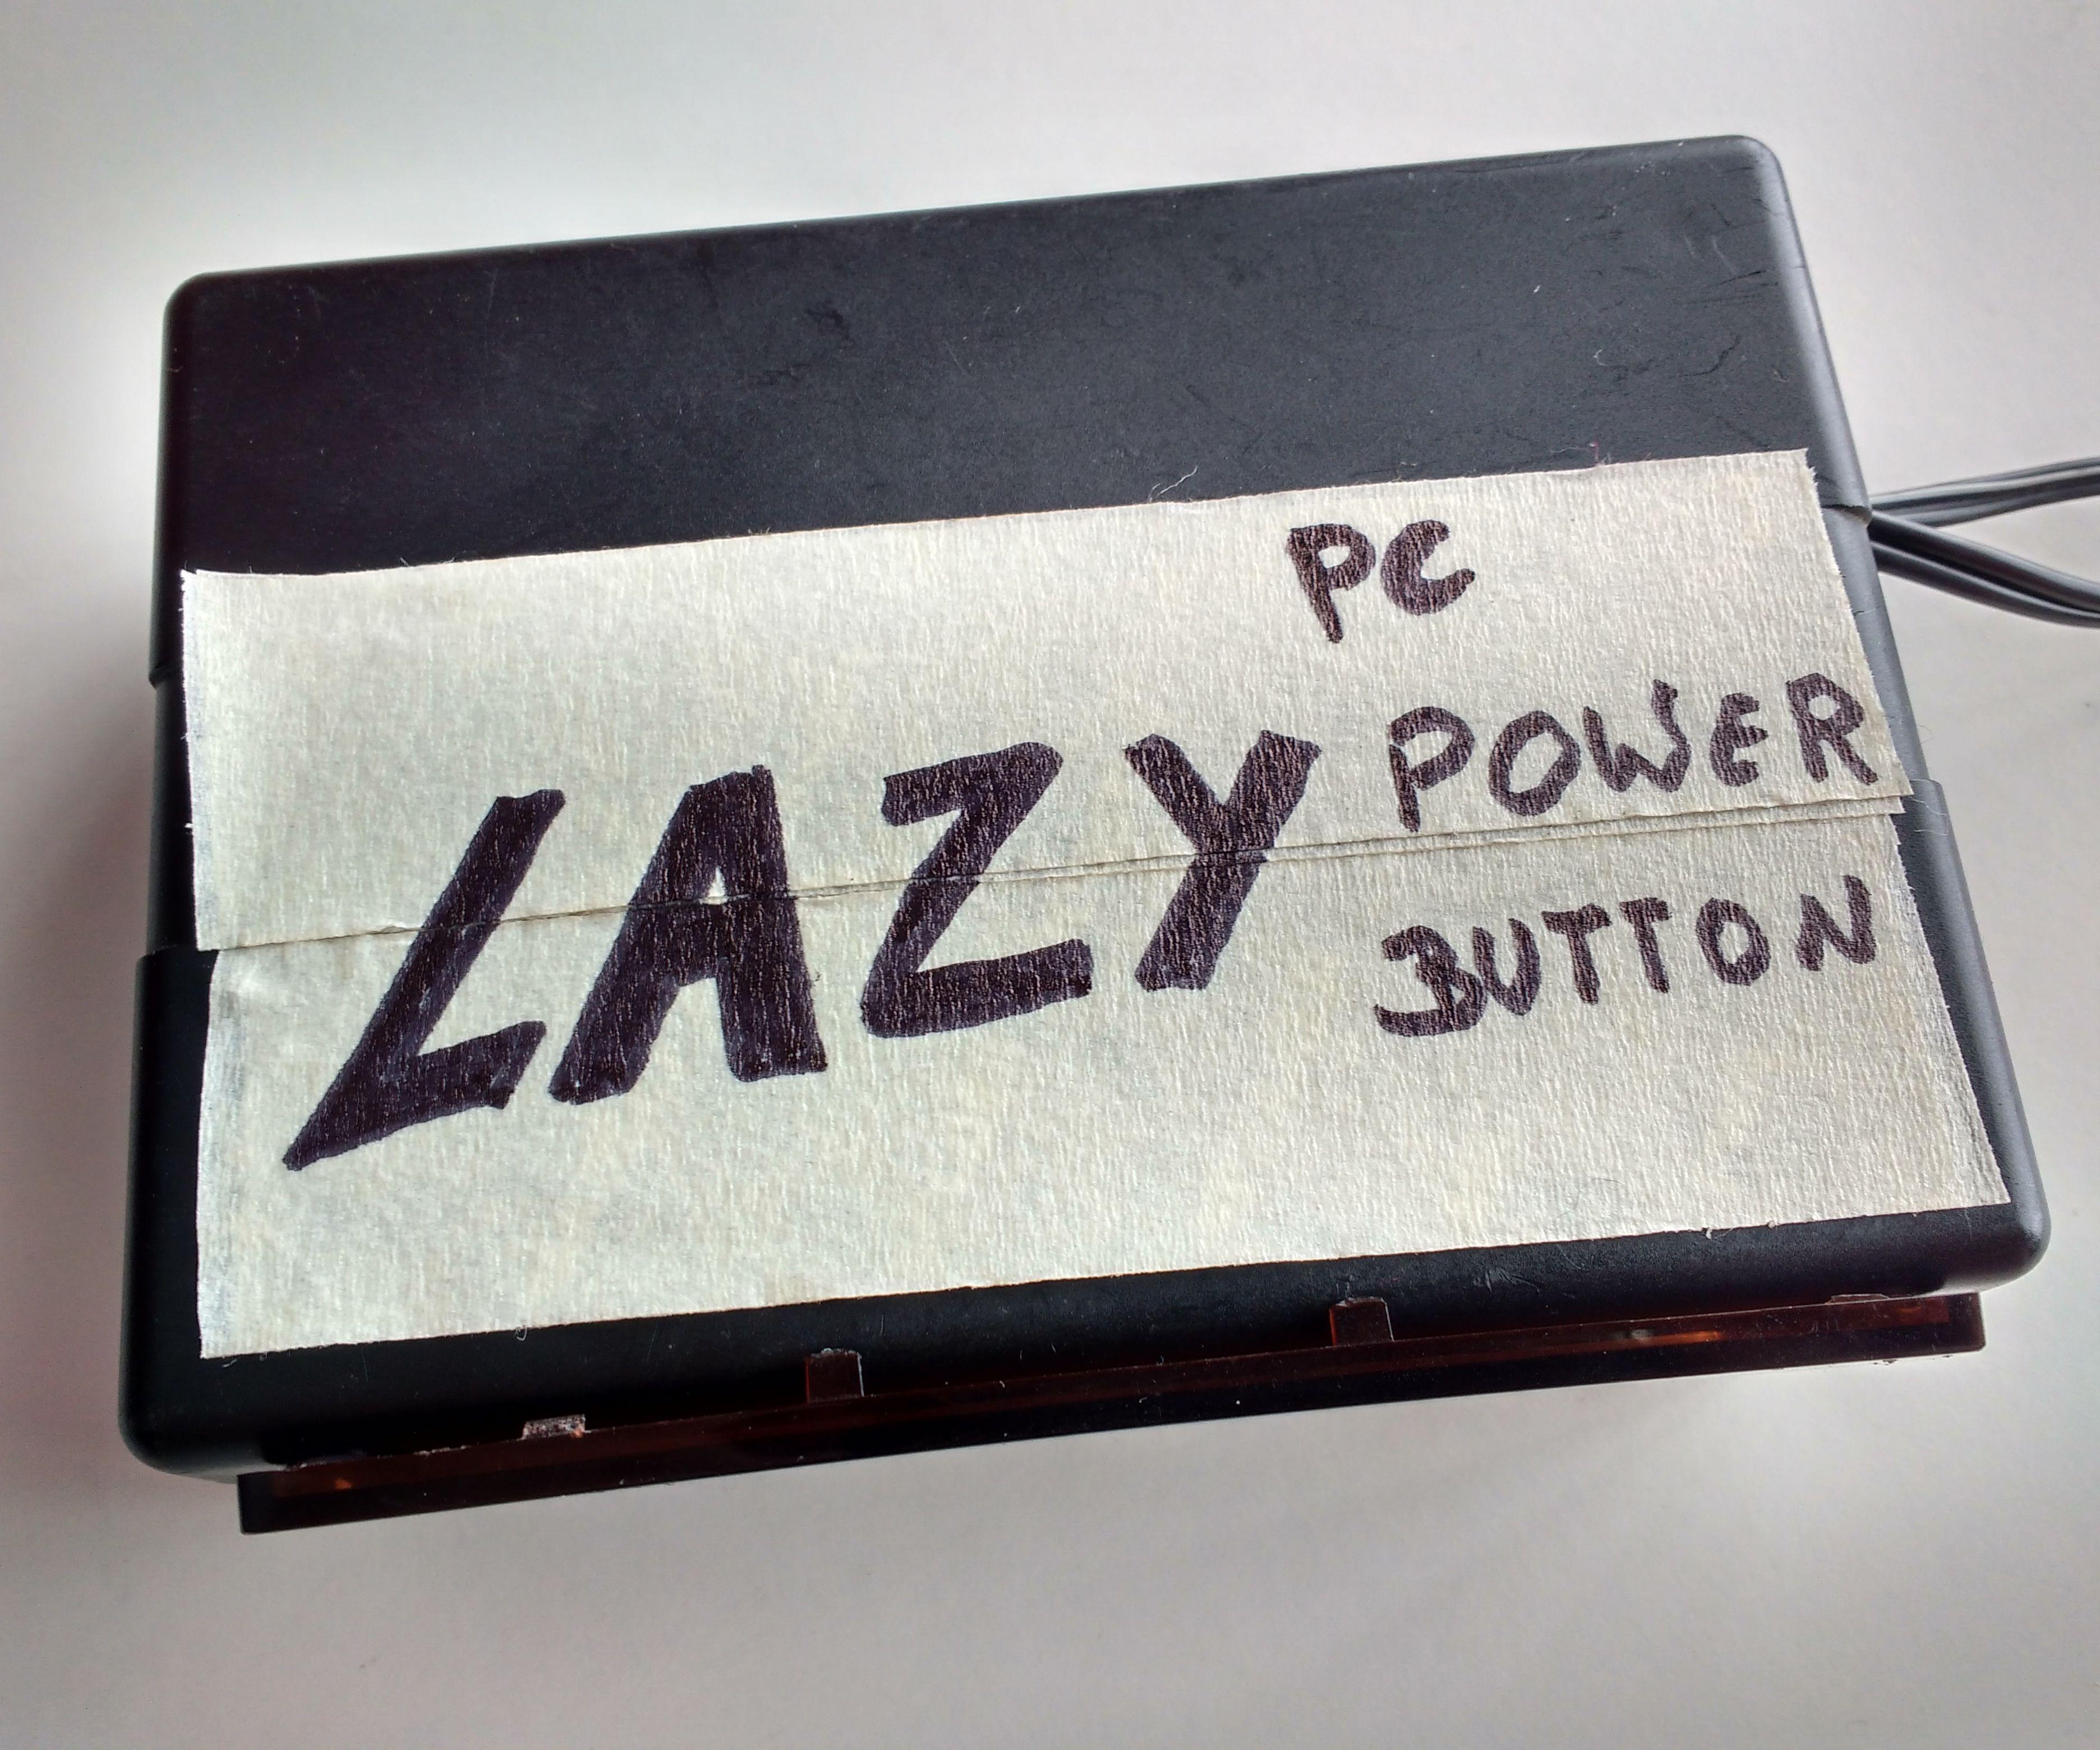 Lazy Pc Power Button